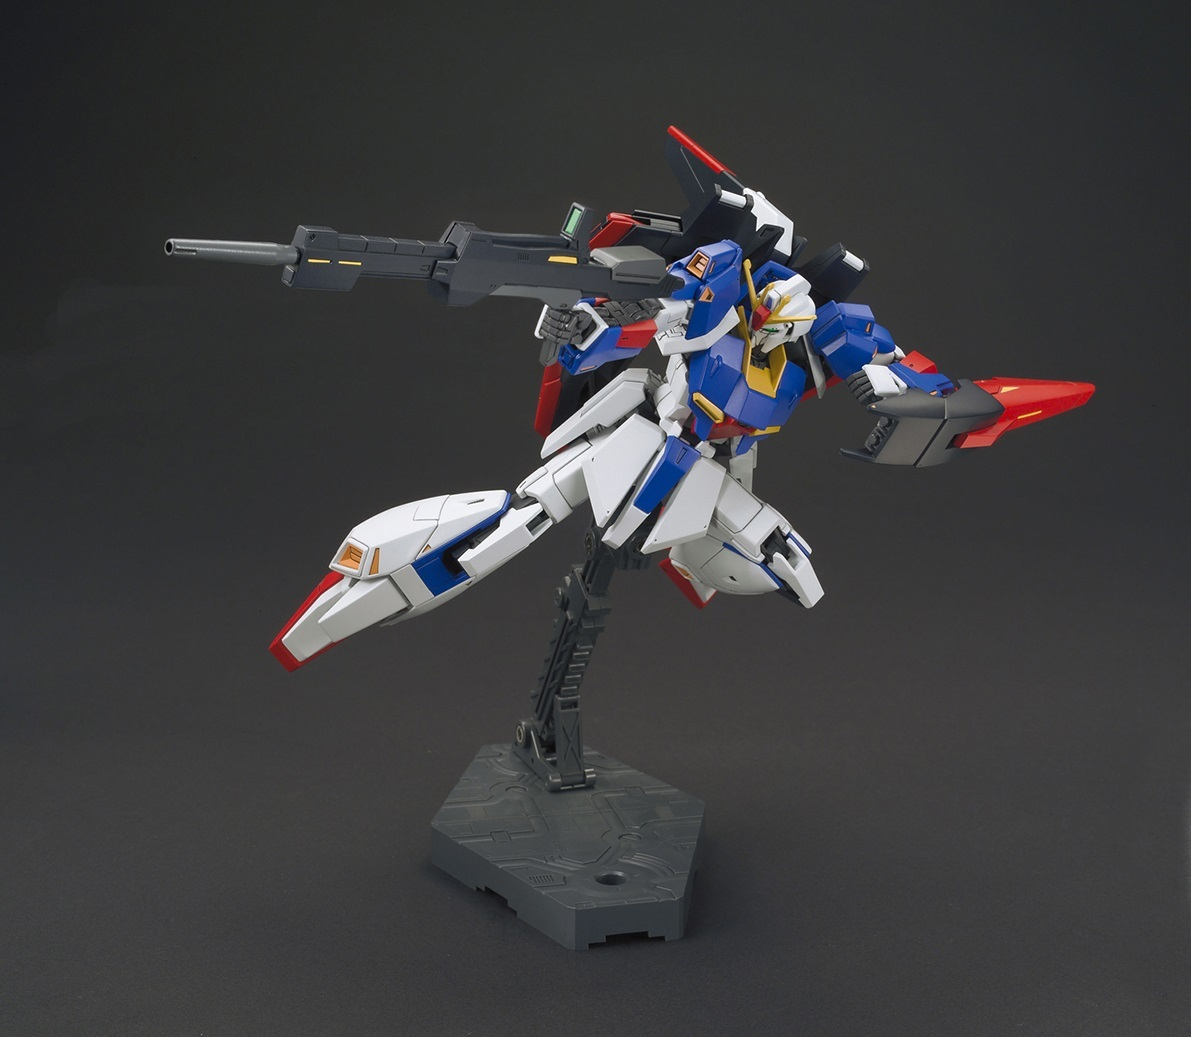 1/144 HGUC Zeta Gundam - Model Kit (Gunpla Evolution Project) image